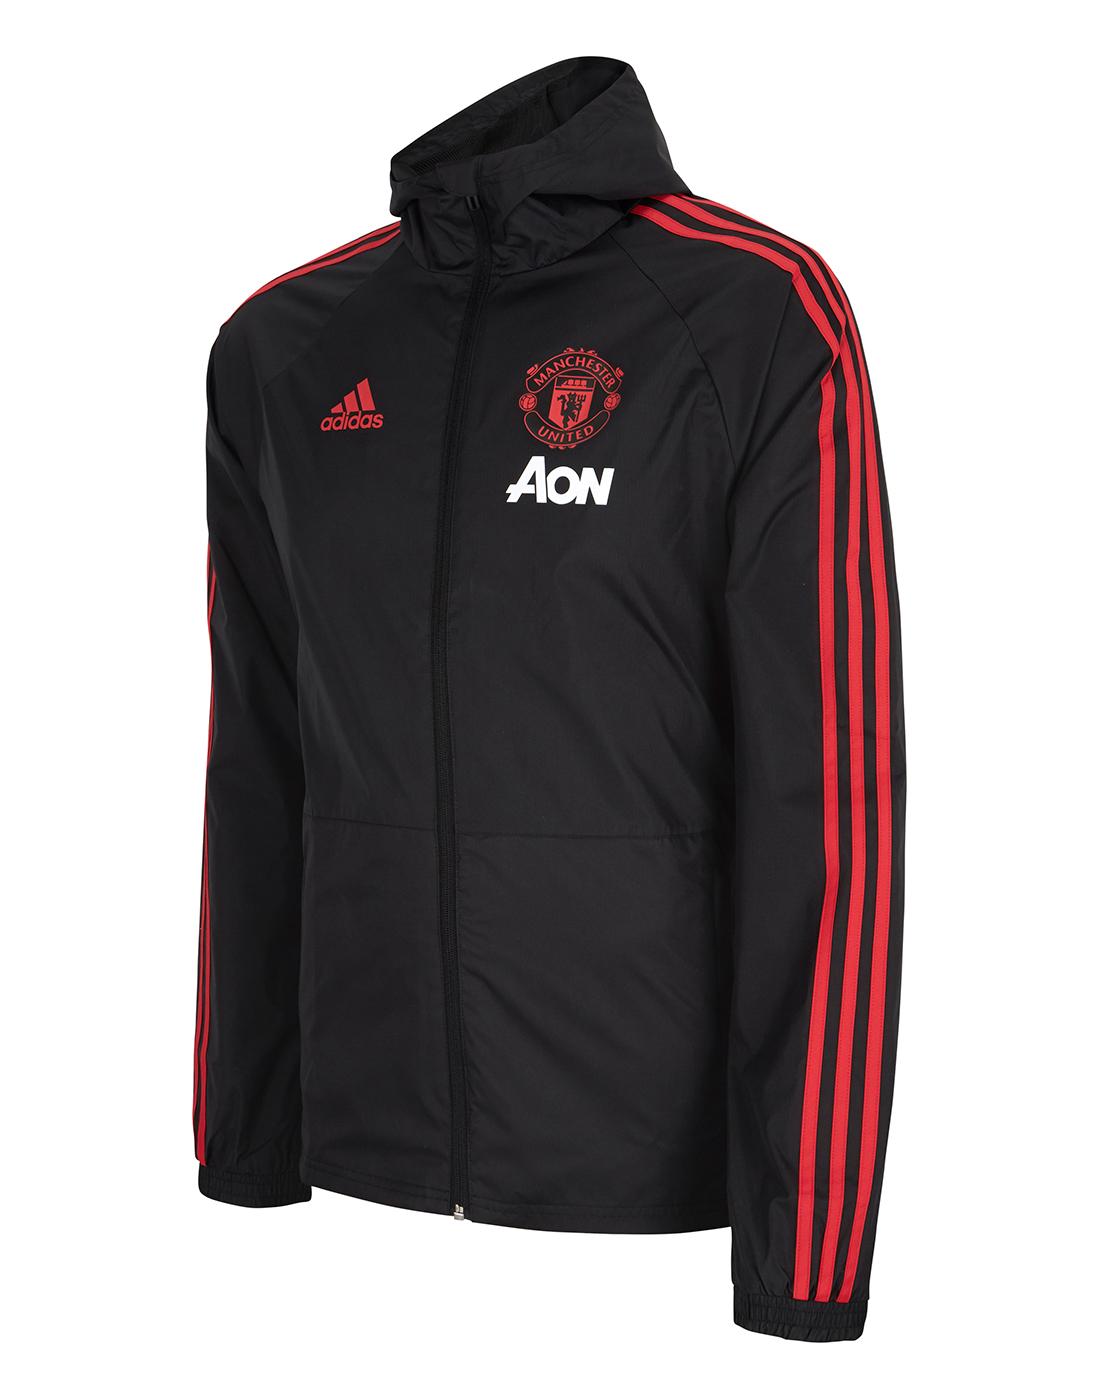 online store a5324 e50b5 Man United Black Rain Jacket | adidas | Life Style Sports